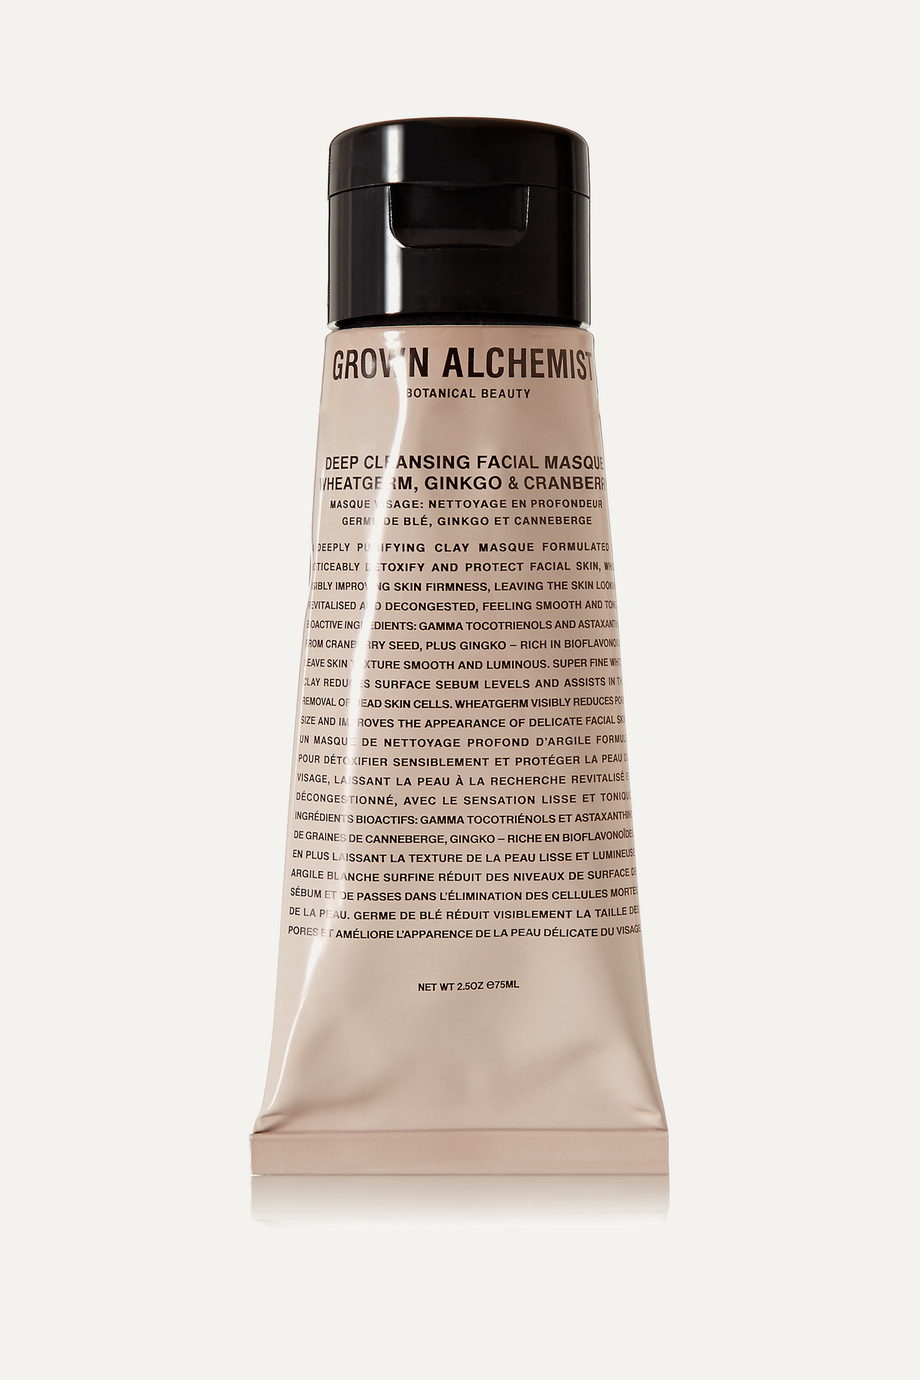 Grown Alchemist Deep Cleansing Facial Masque, 75 ml – Reinigungsmaske